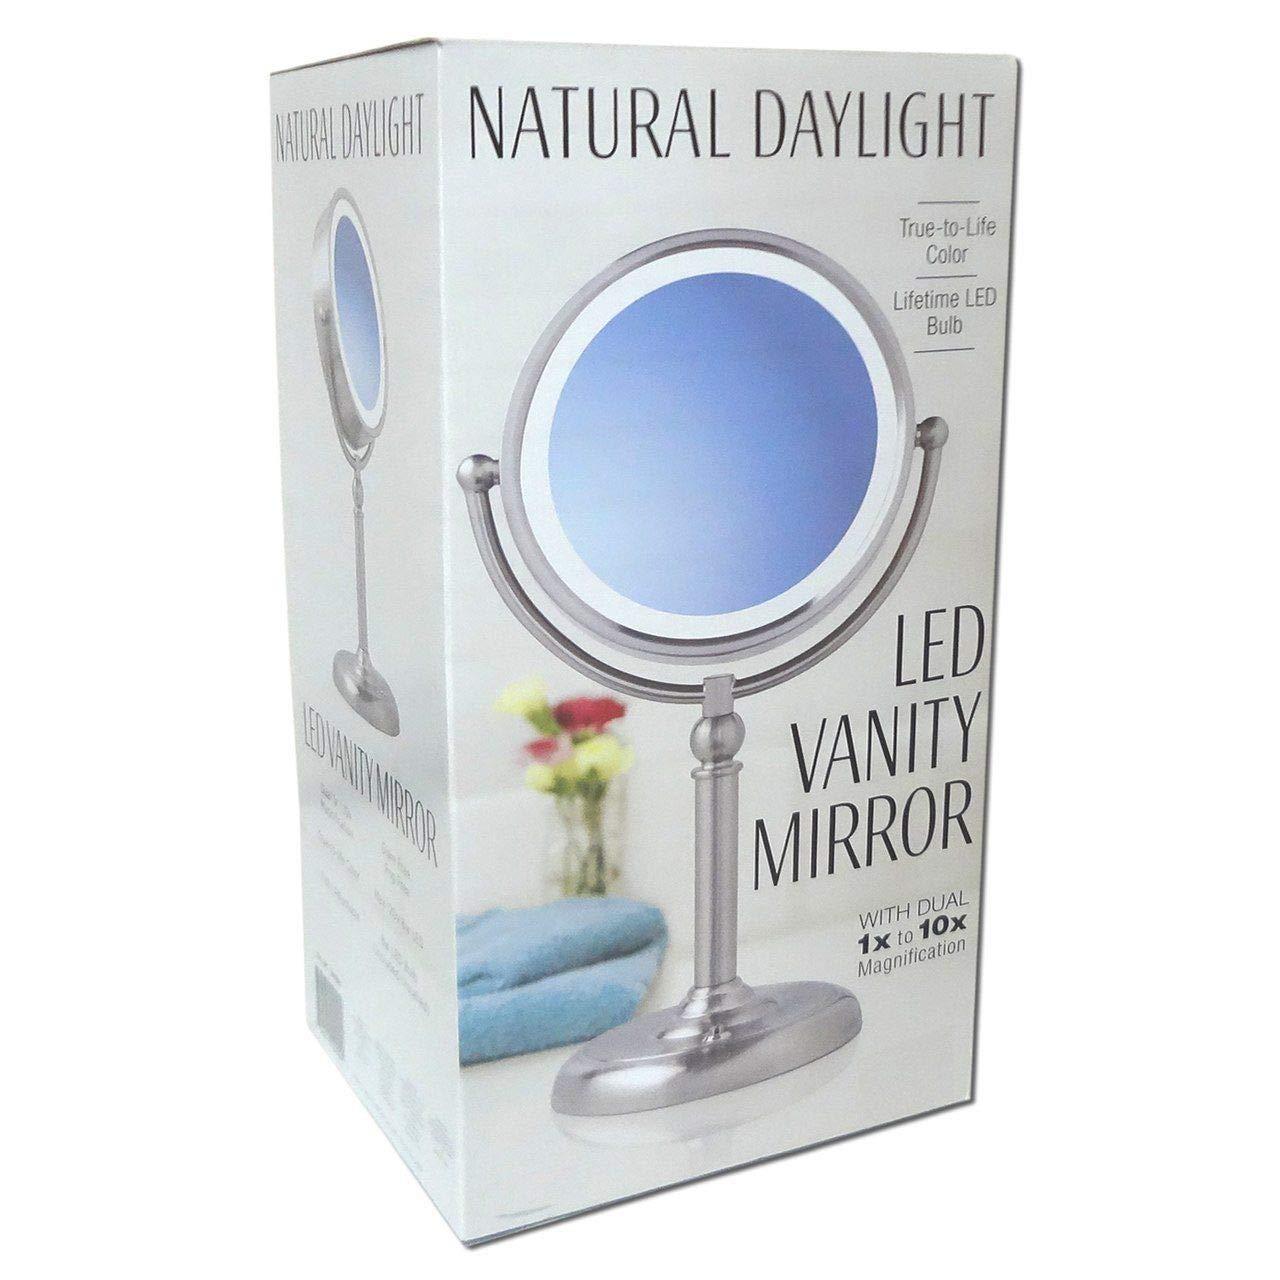 Natural Daylight LED Vanity Mirror